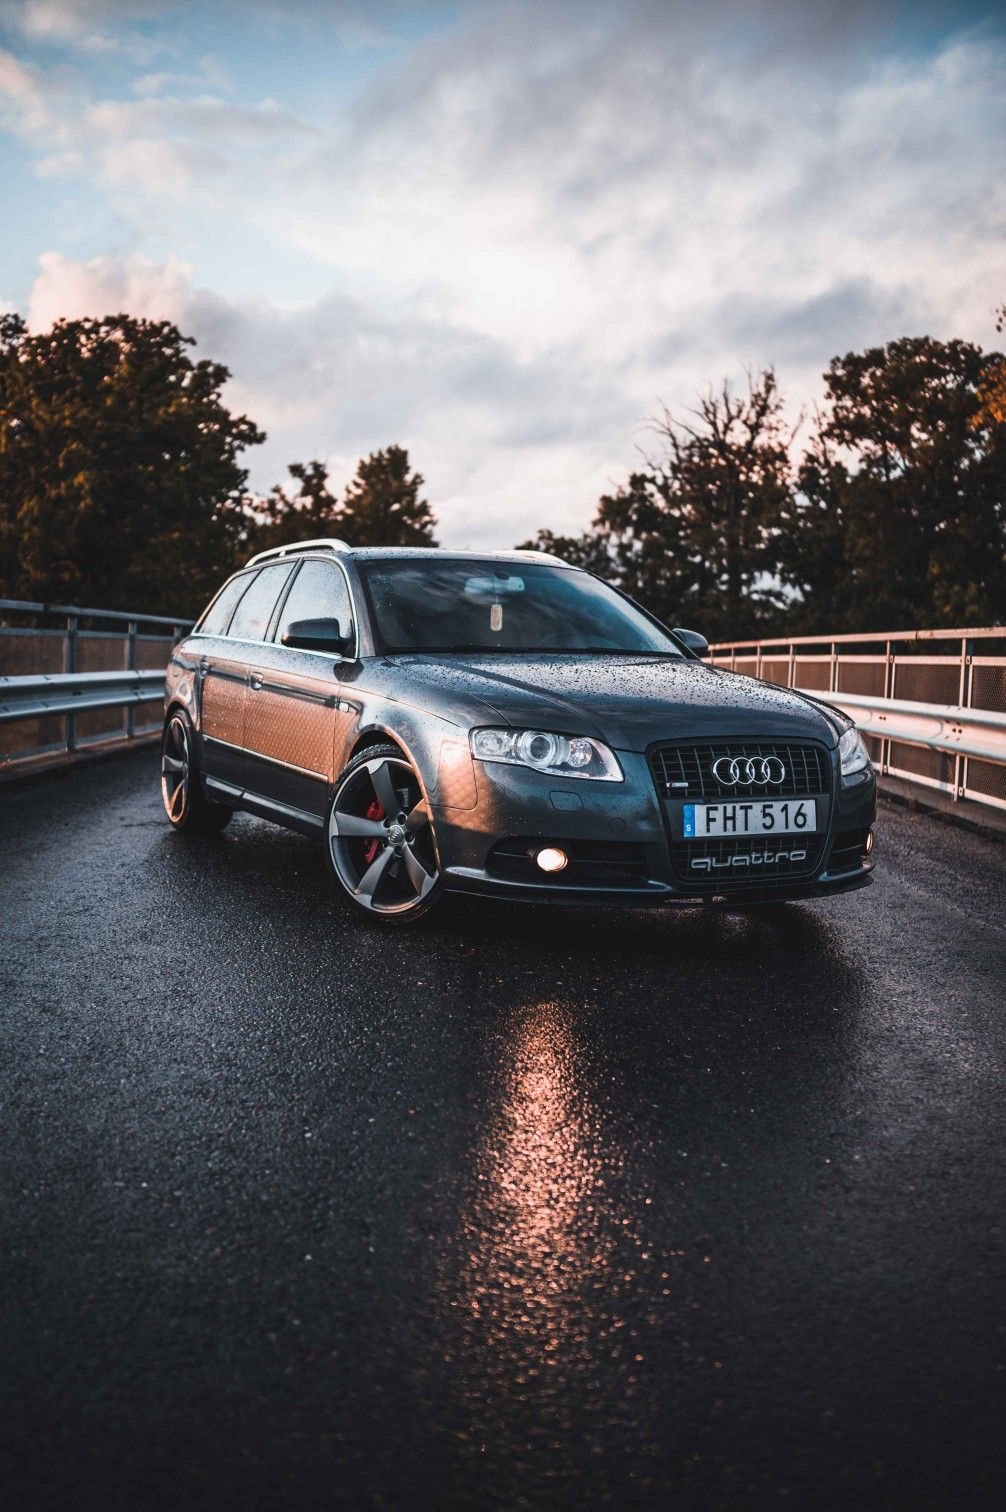 Car Rs5 A4 S4 Audi Rims Rotor Street Audi B7 Audi A4 Audi A4 B7